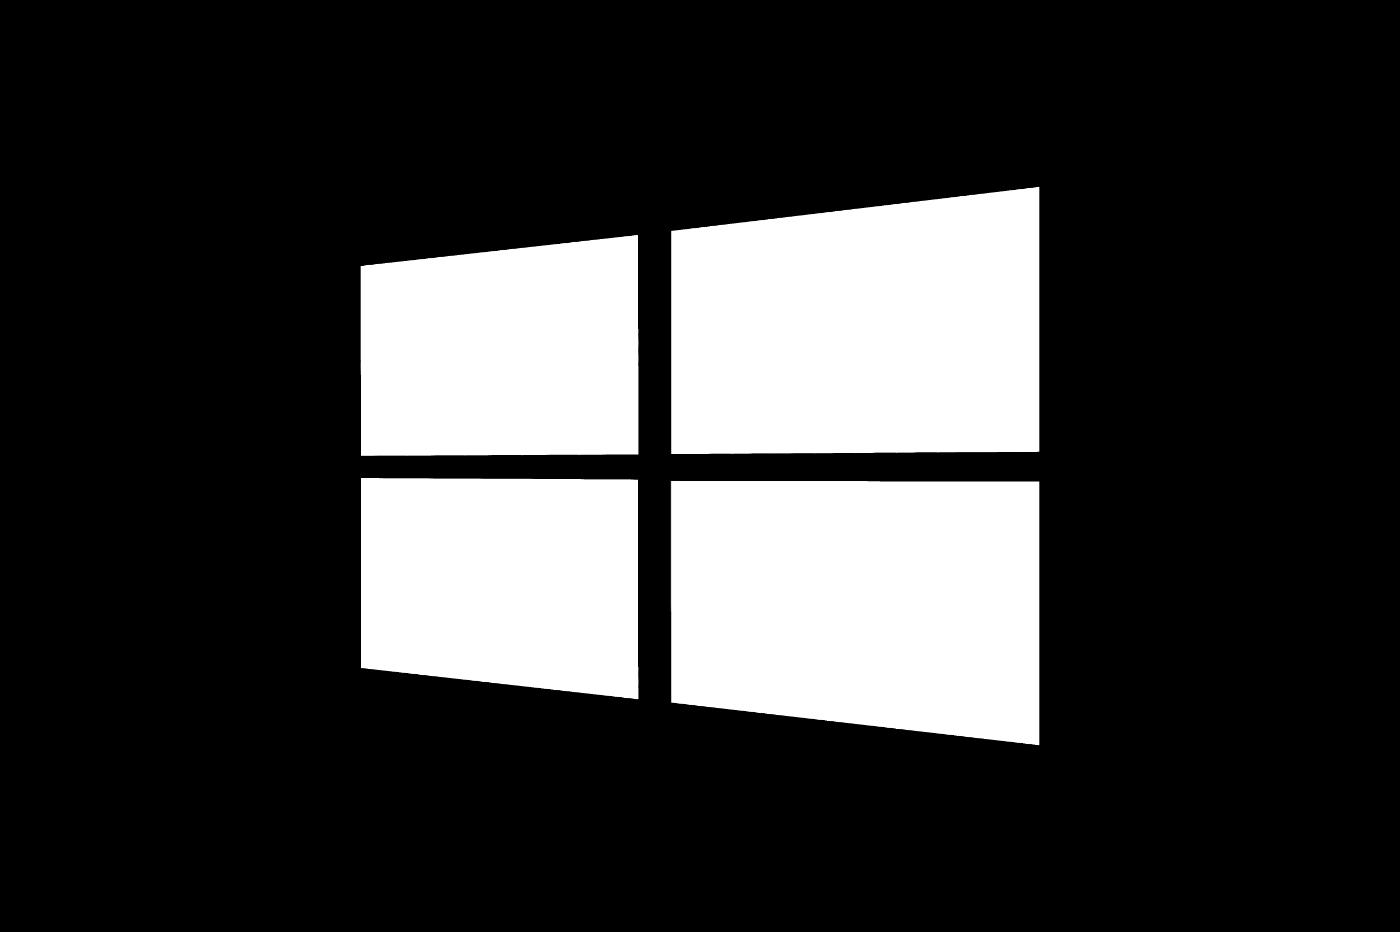 Windows Microsoft 2021